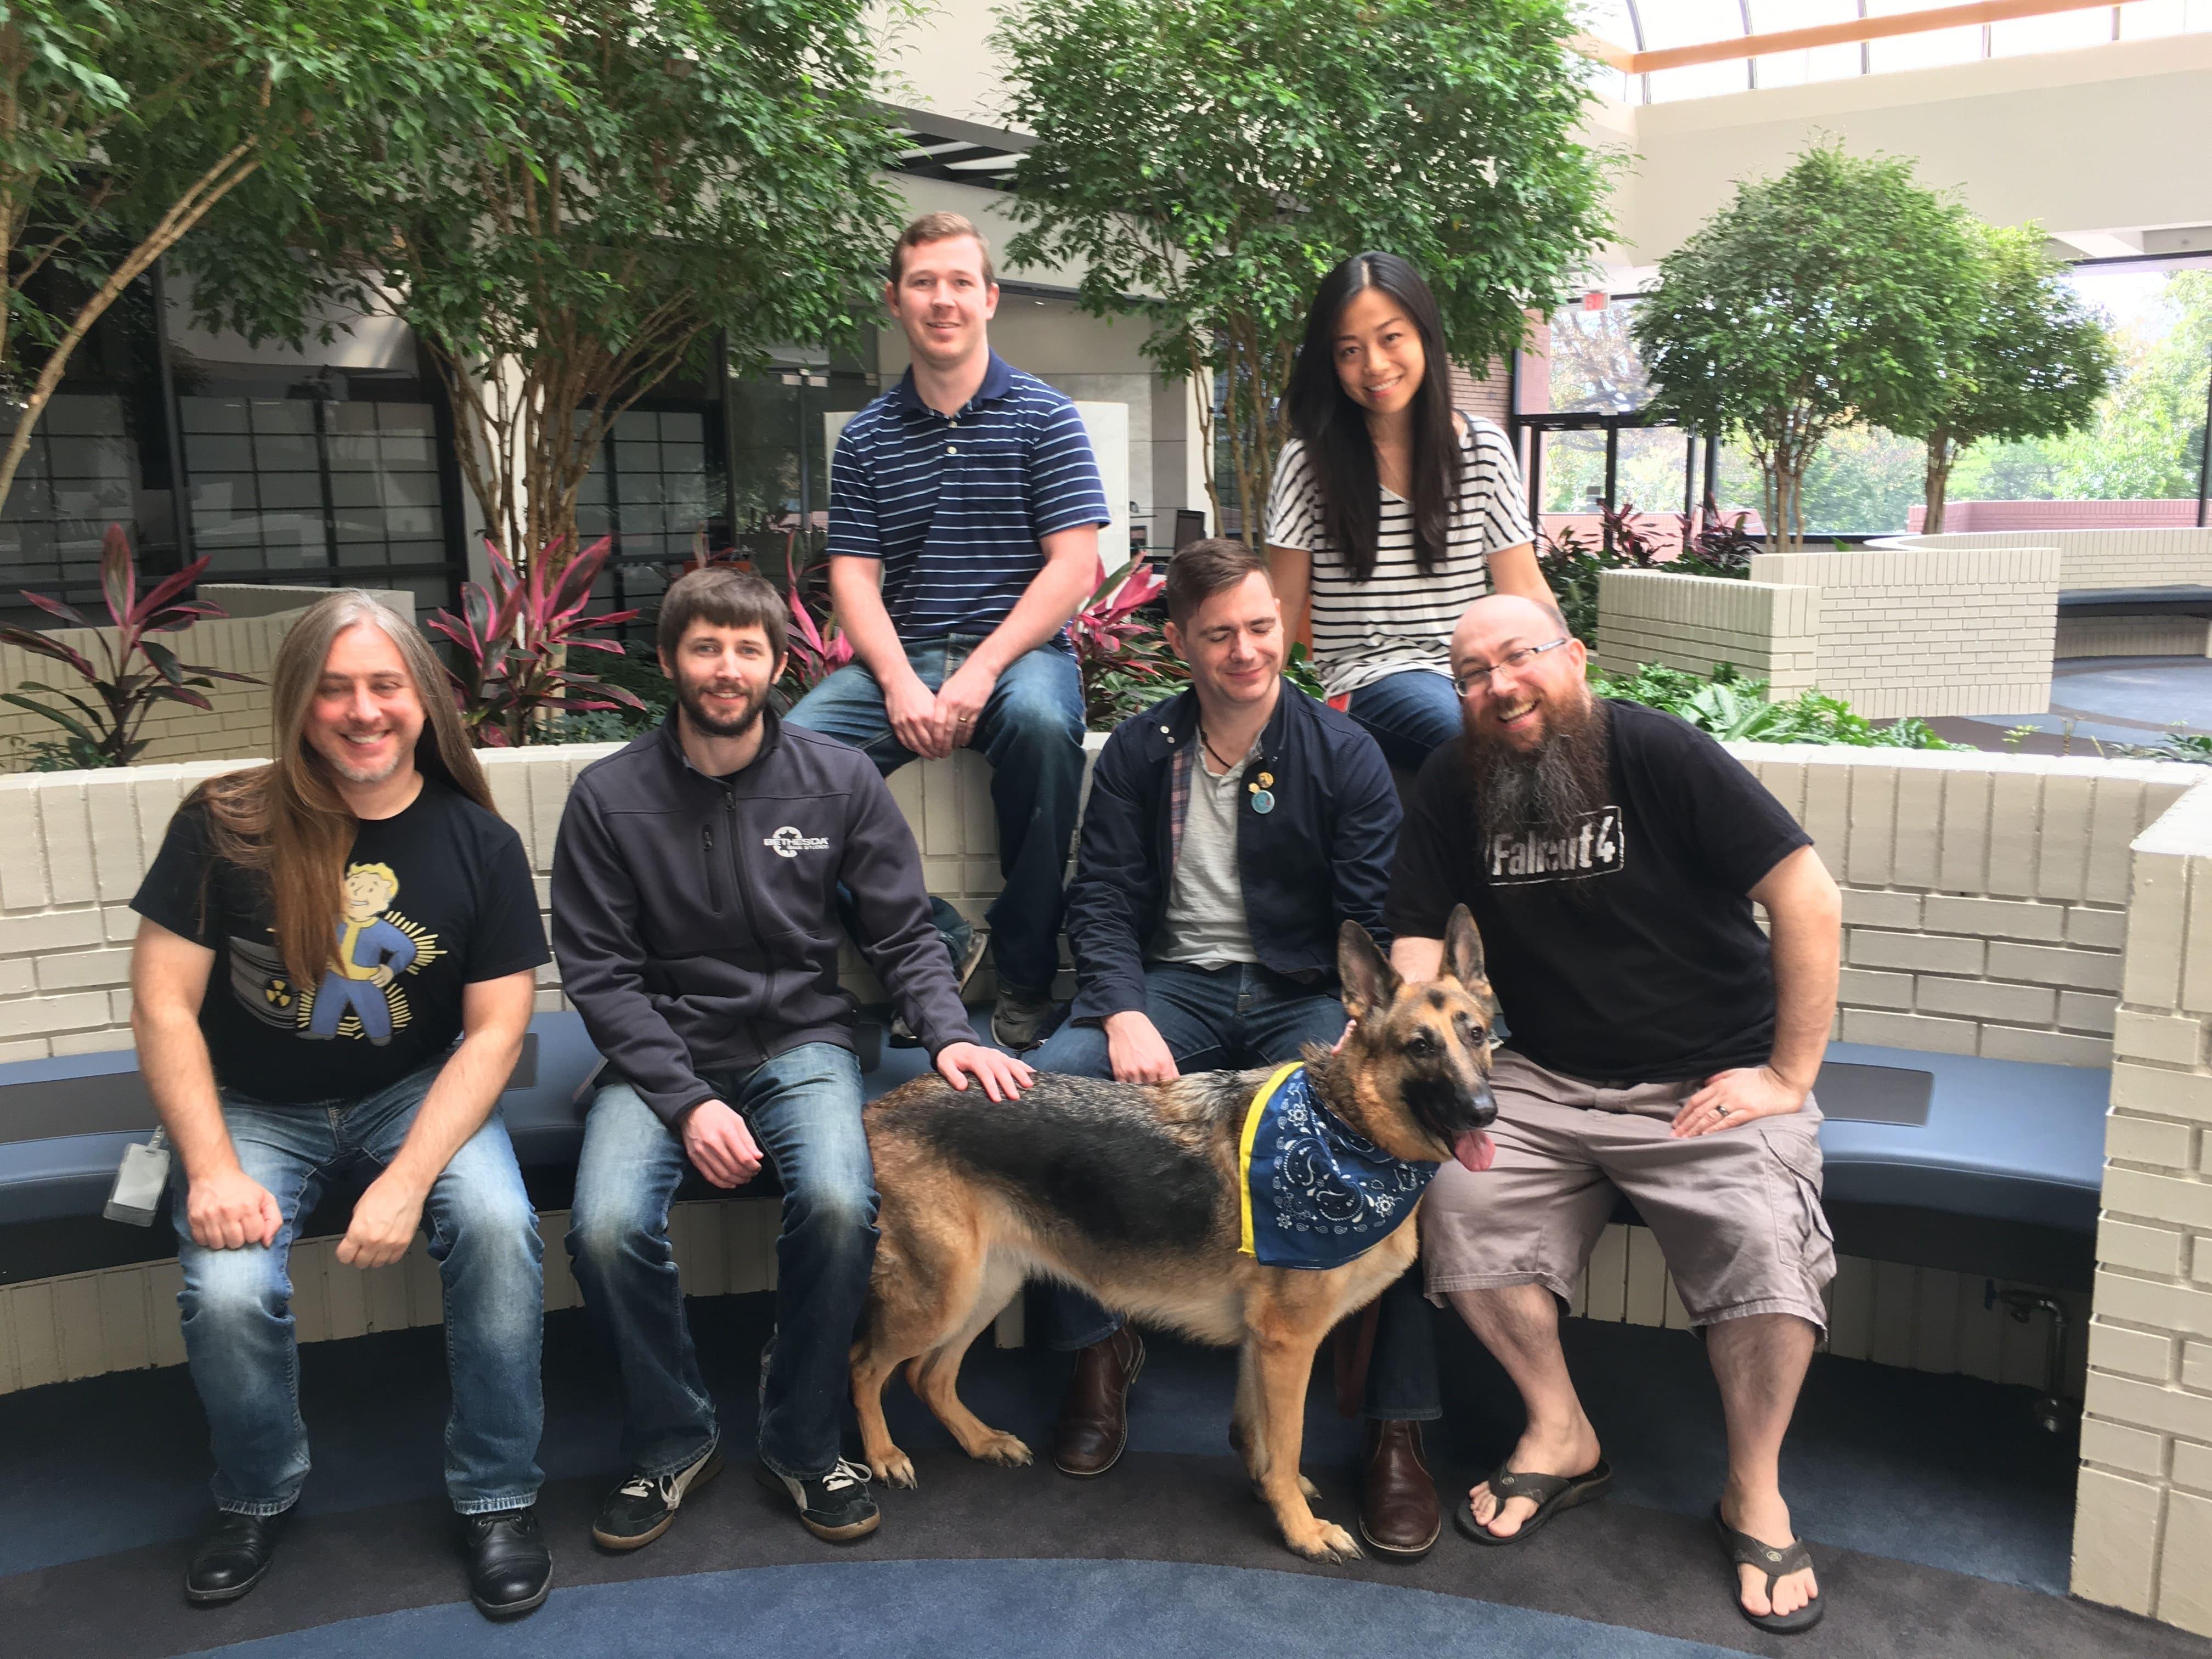 Xbox联合B社捐款《辐射4》狗肉原型-iD游源网